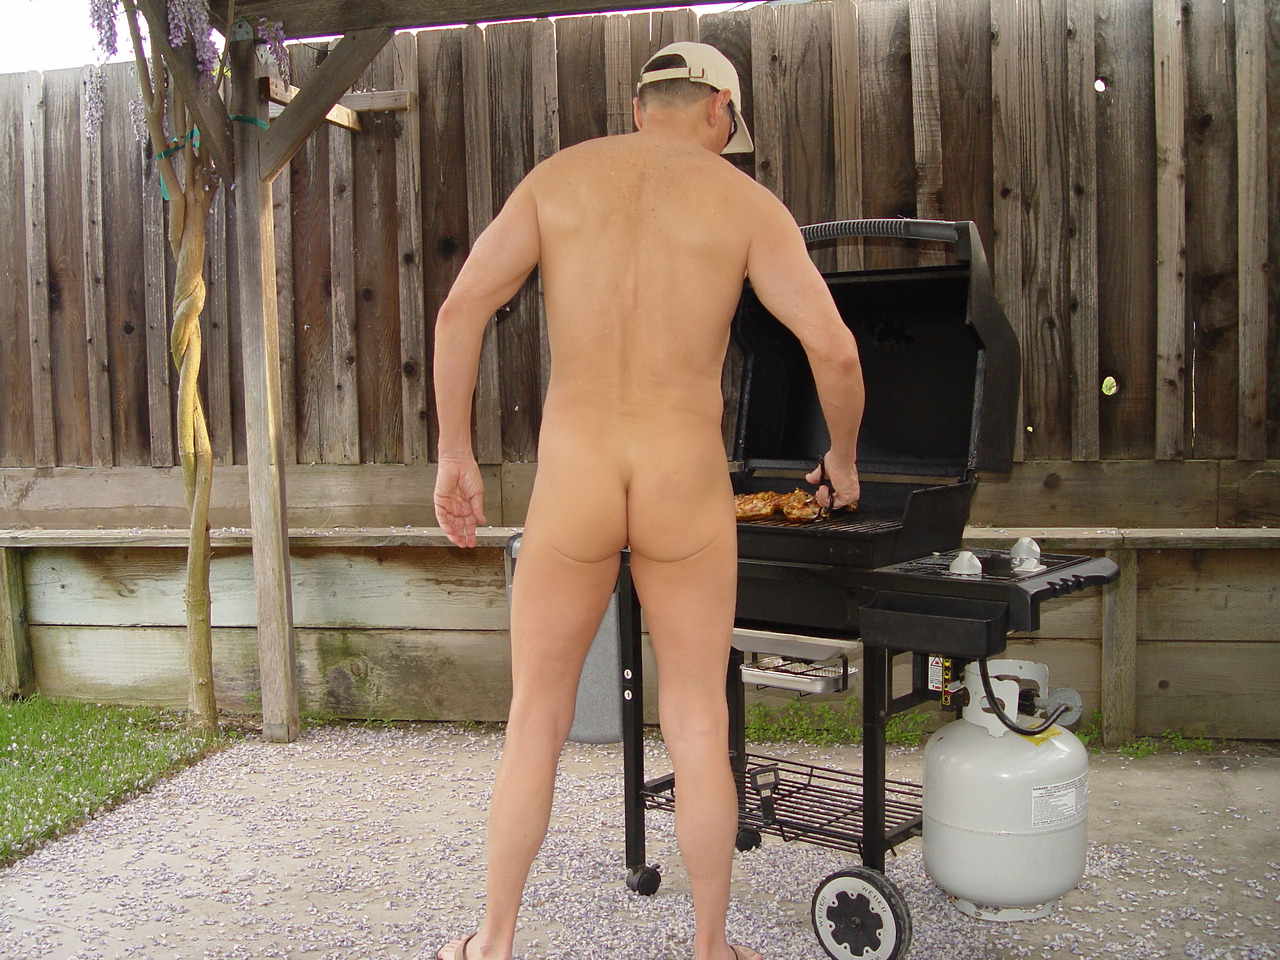 Again universe grill nud ex girlfriend photos